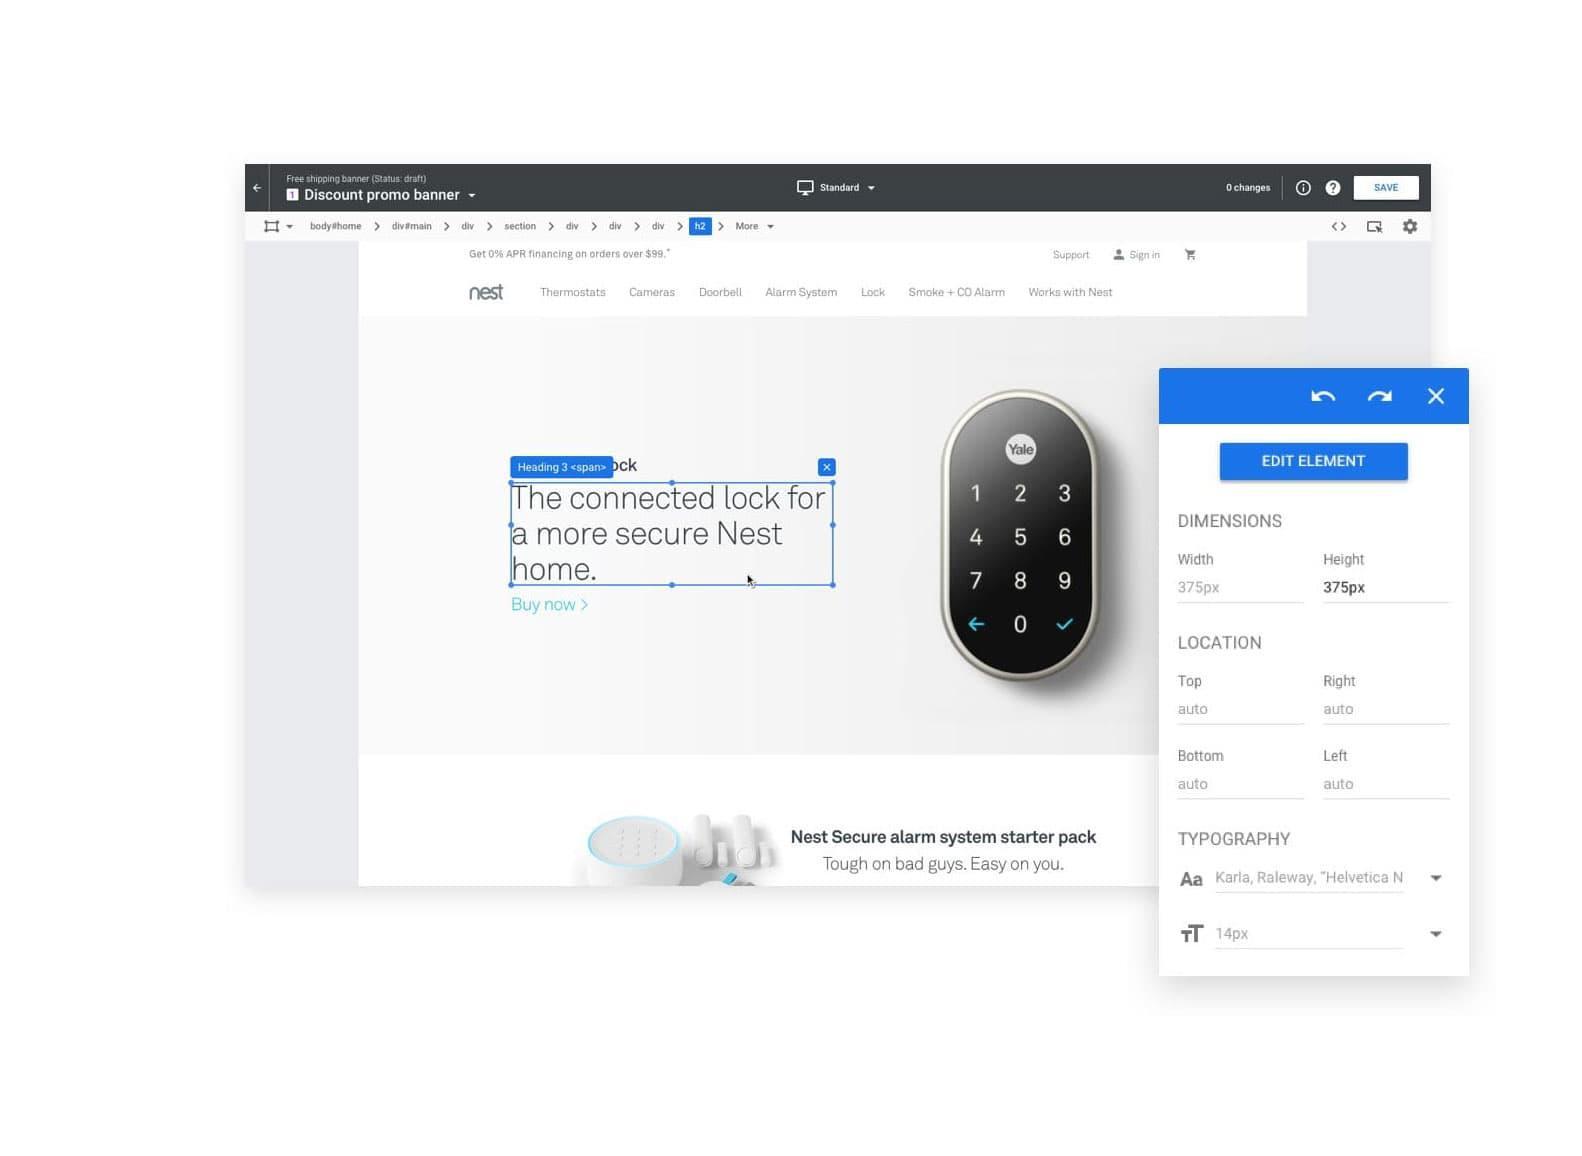 Google optimize A/B testing tool